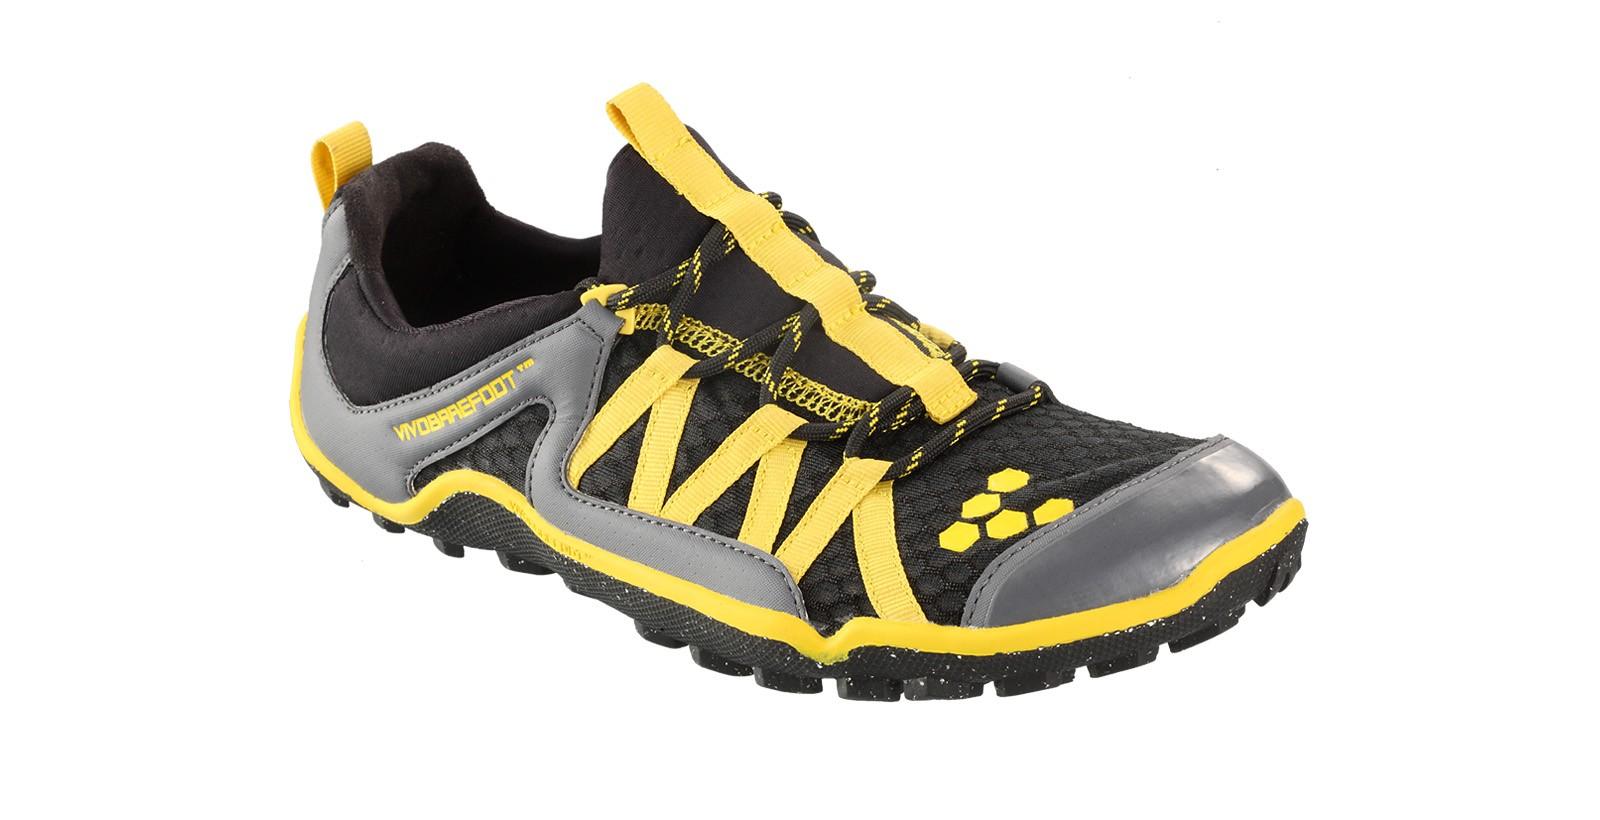 Good Shoe For Running On All Terrains